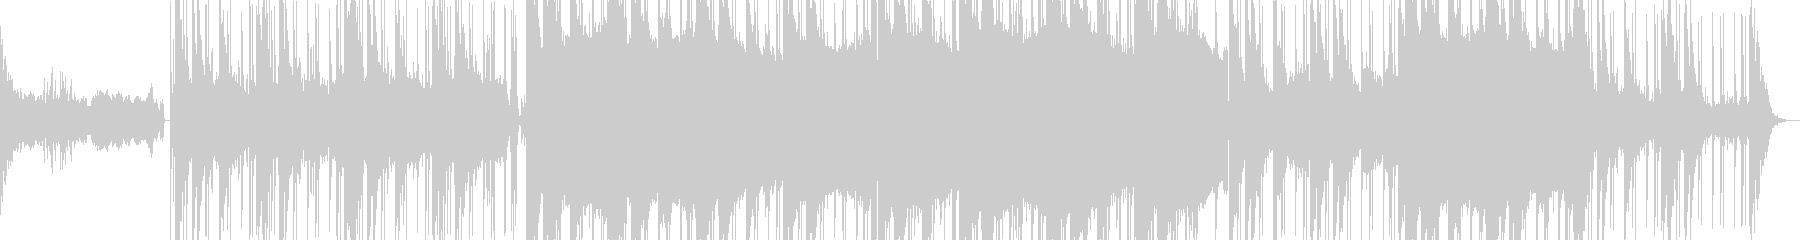 Electronicaの未再生の波形